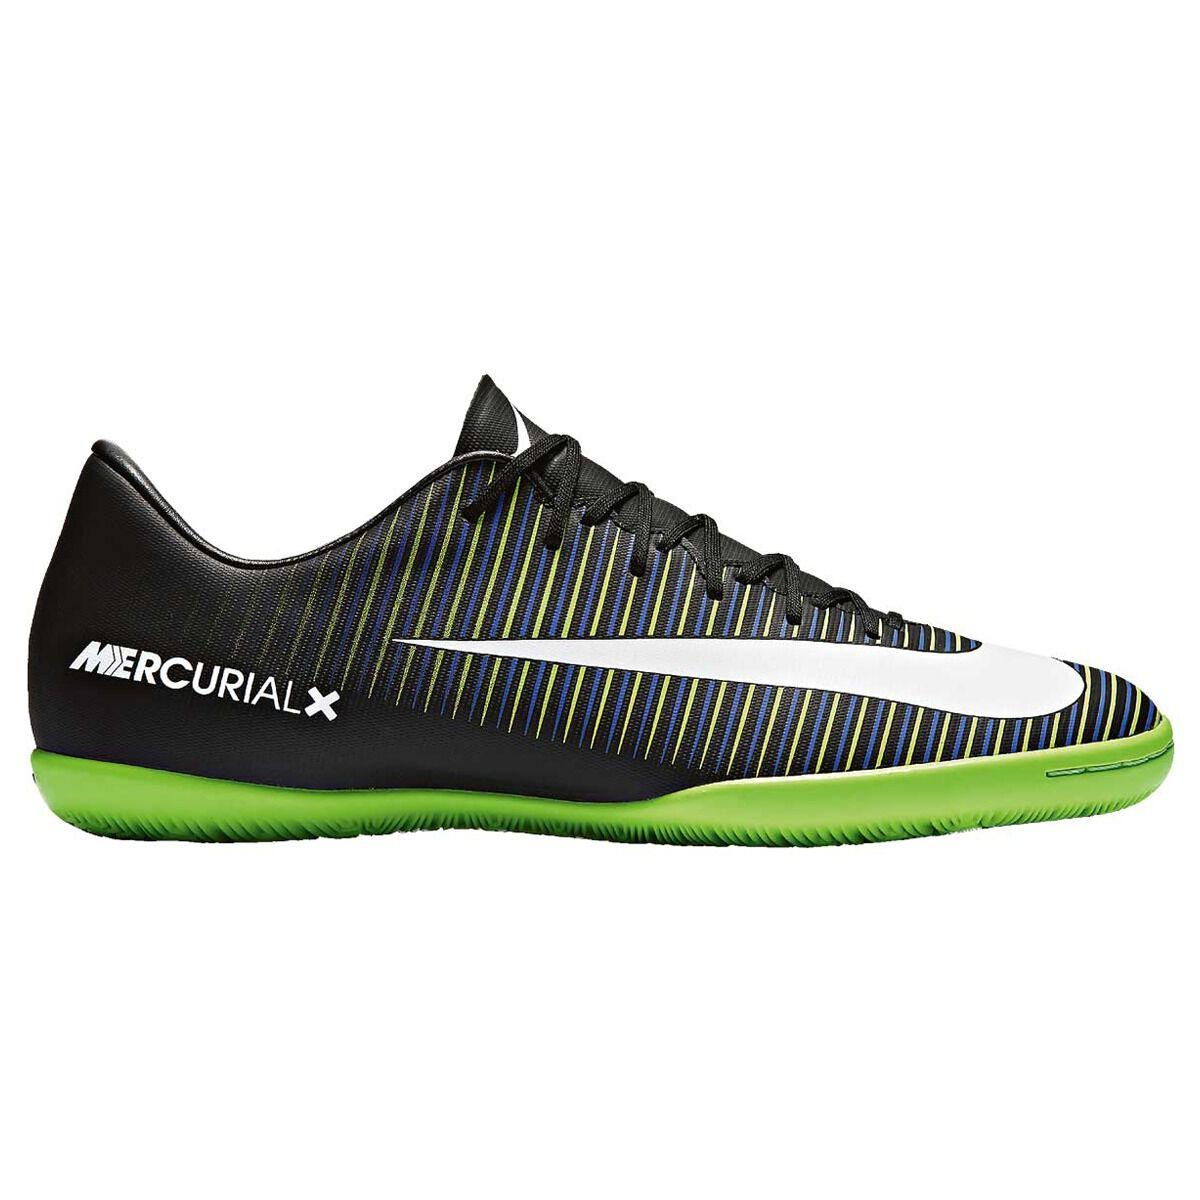 buy popular 80e9d 58978 ... good nike mercurialx victory vi mens indoor soccer shoes black white us  9.5 adult black 851ea